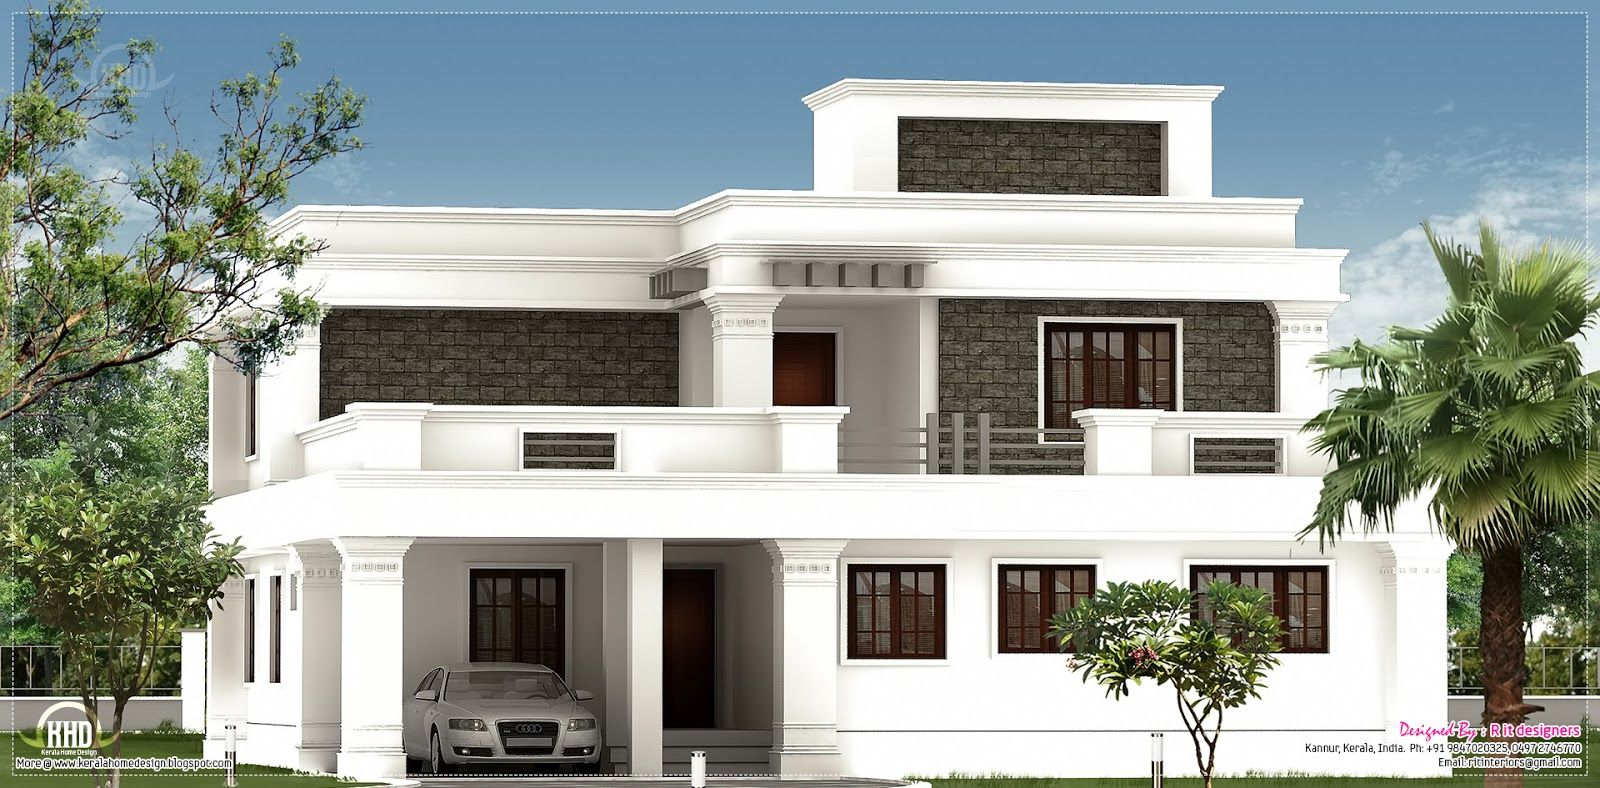 Flat Roof Villa Exterior In 2400 Sq Feet Village House Design